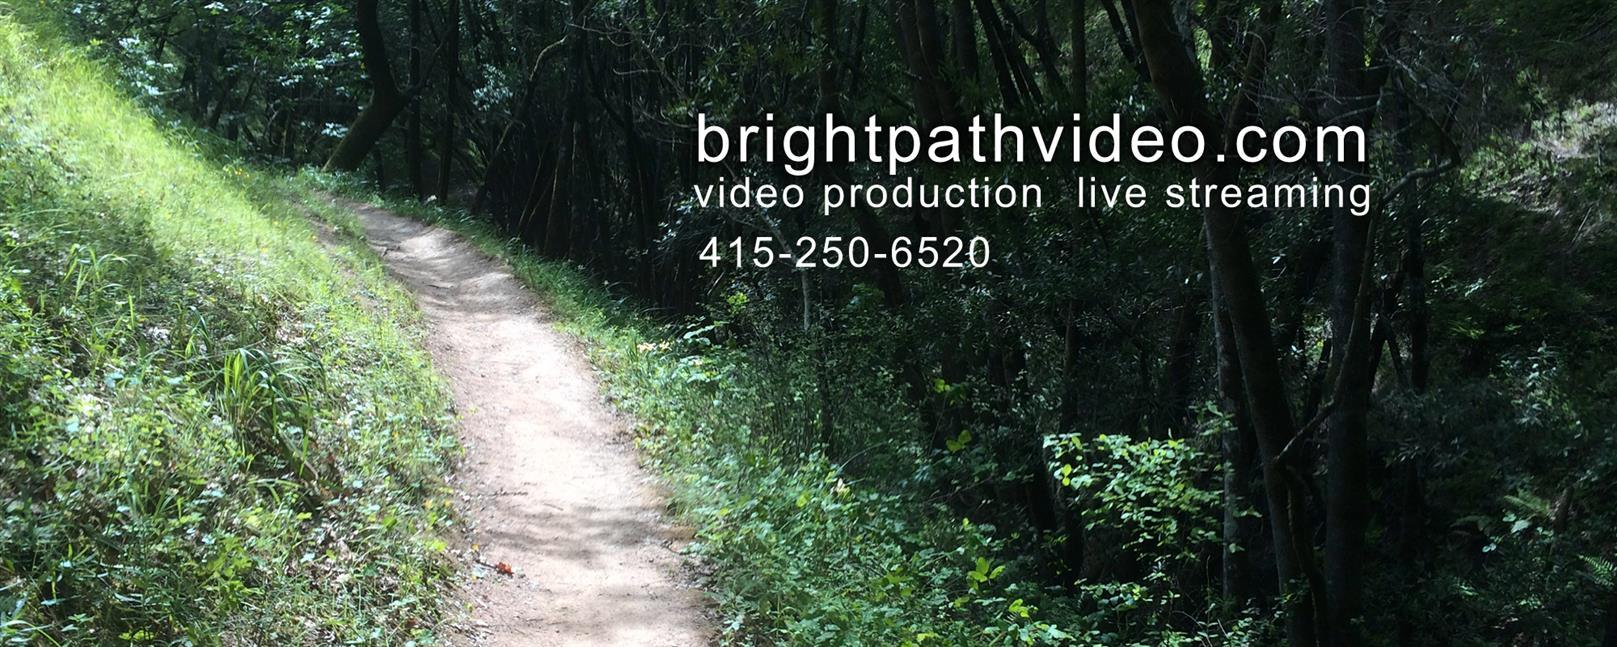 brightpathvideo